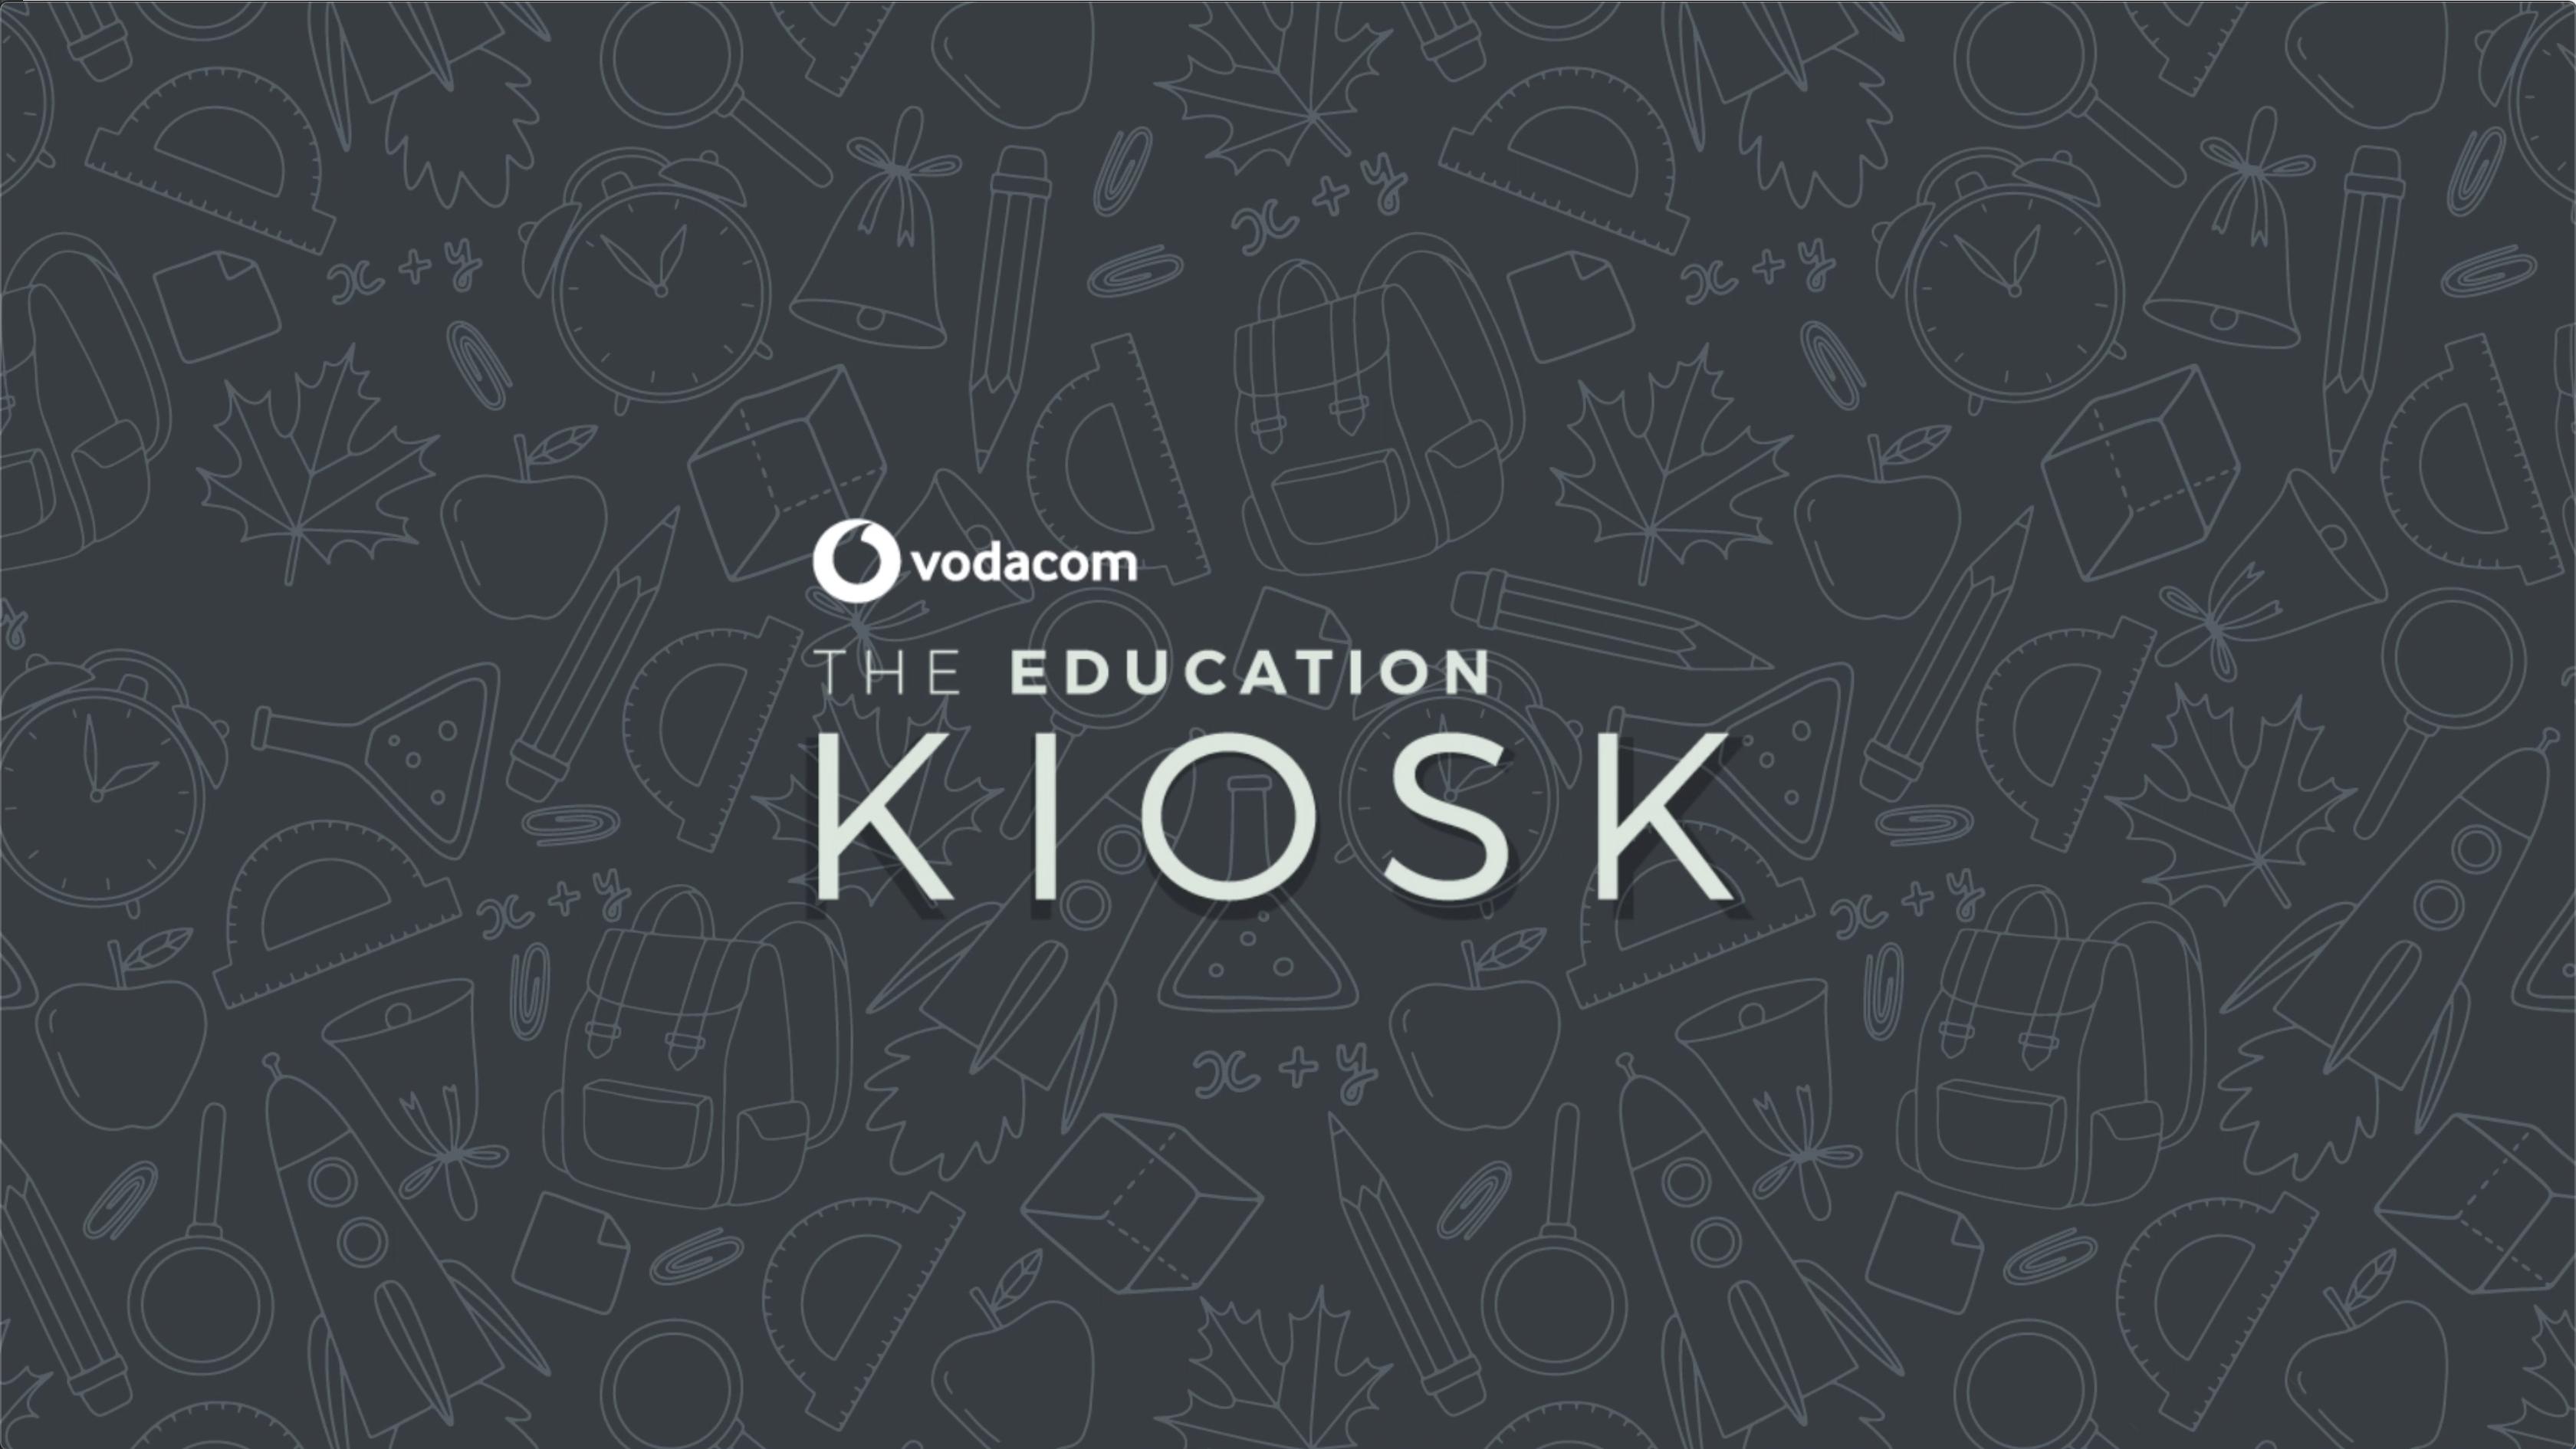 Vodacom Educational Kiosk